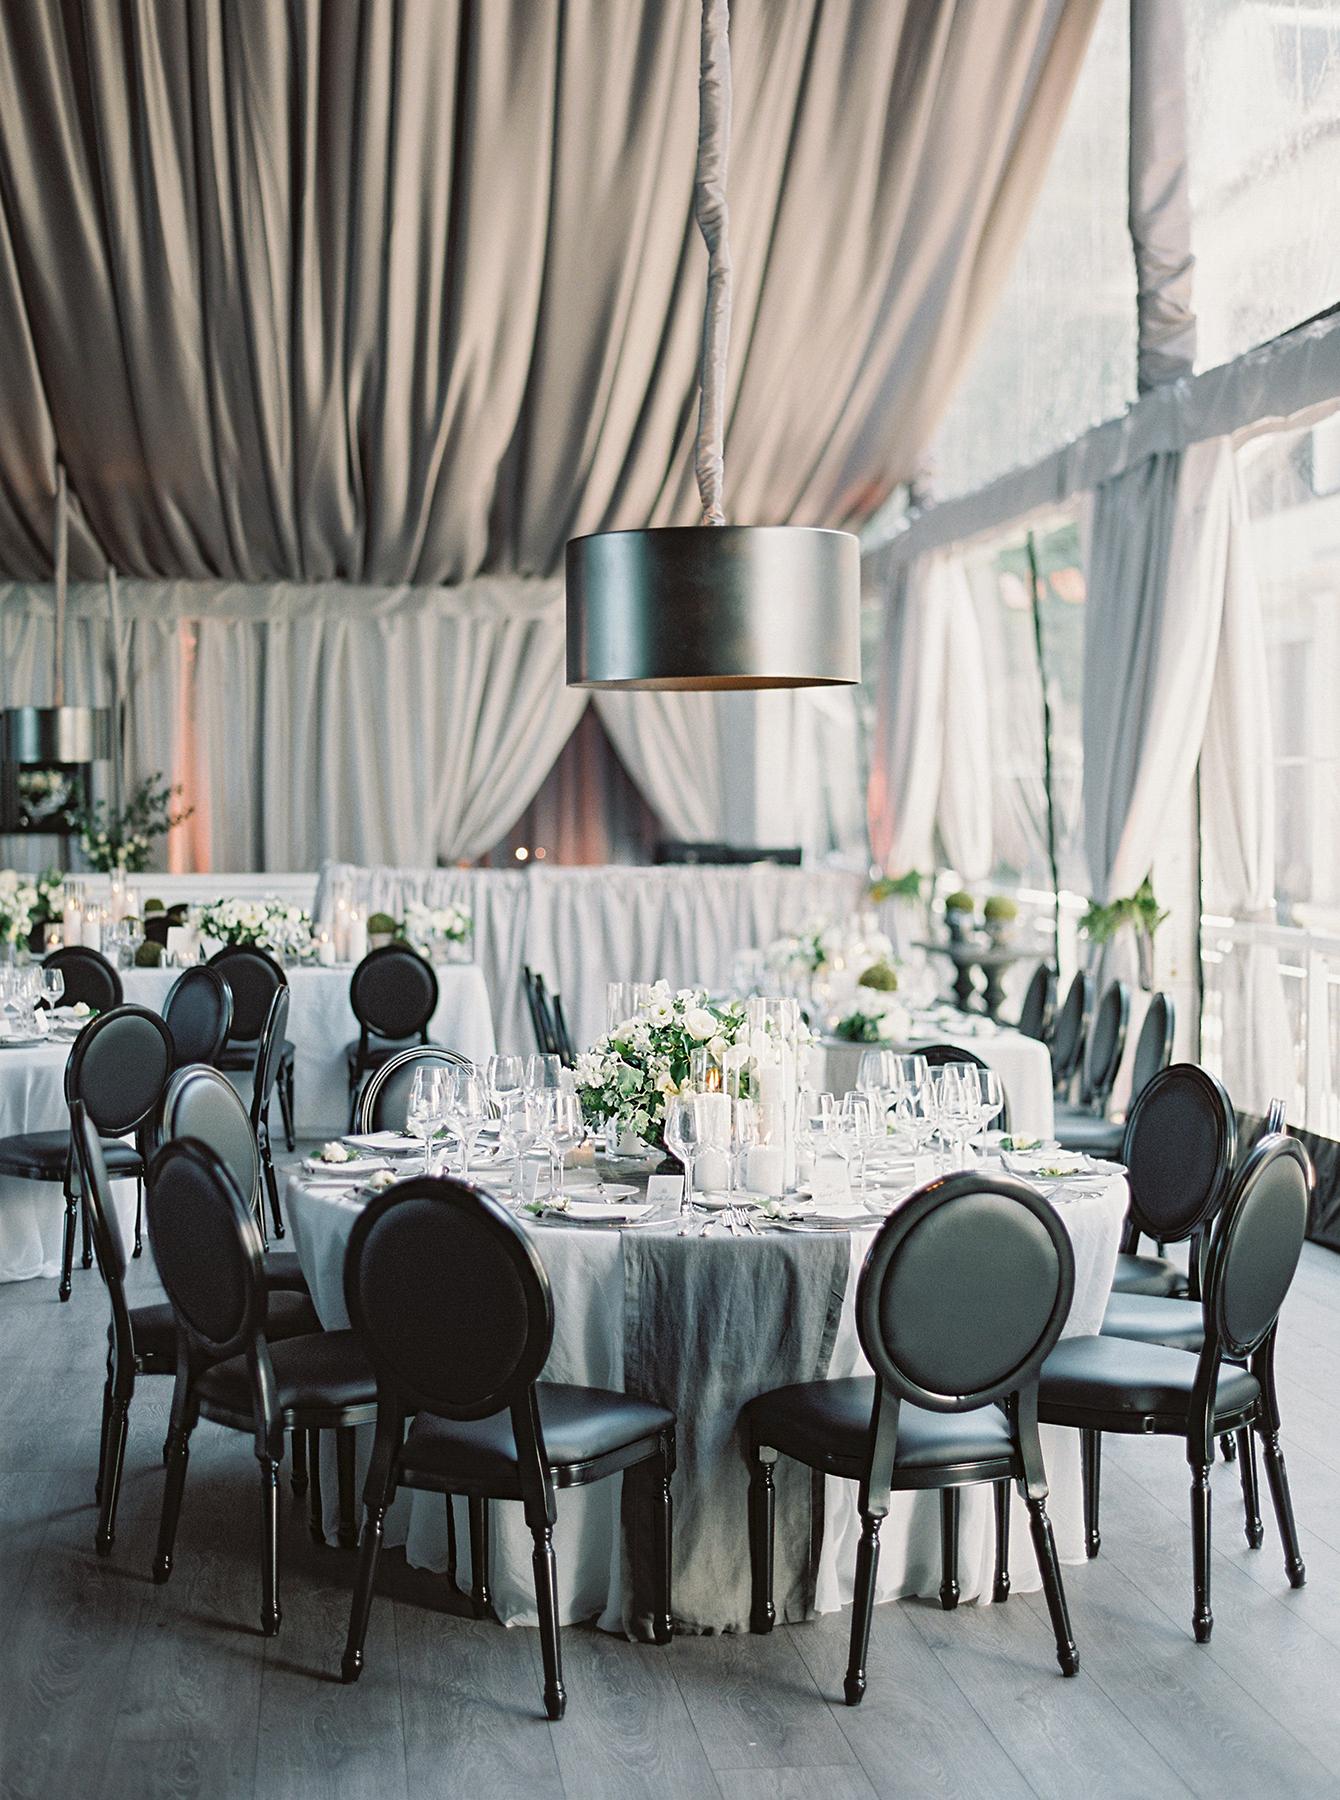 stephanie matt wedding reception decor